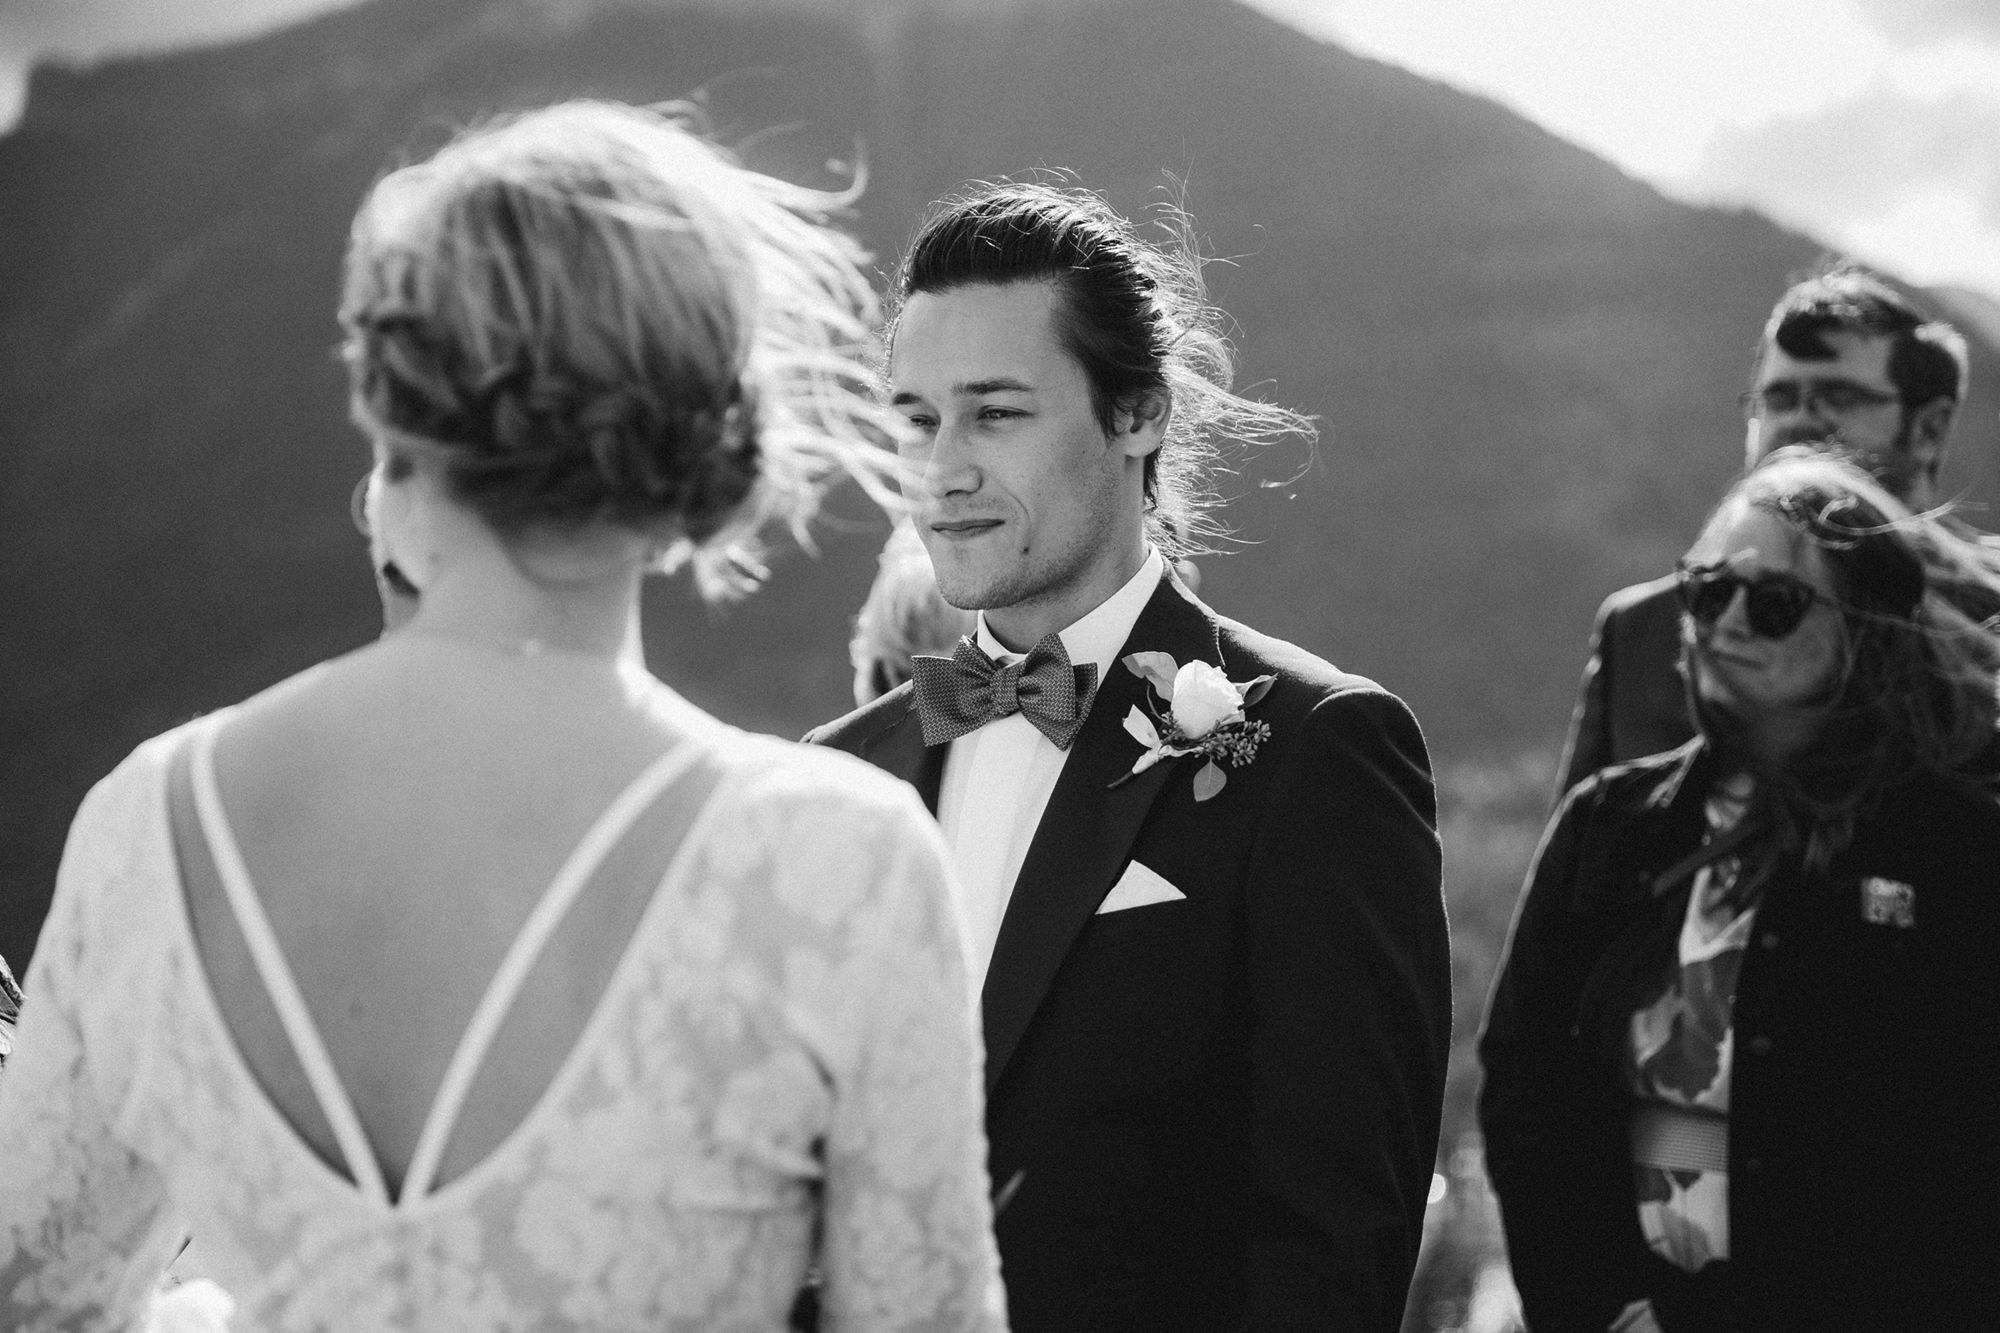 Waterton Wedding David Guenther -34.JPG